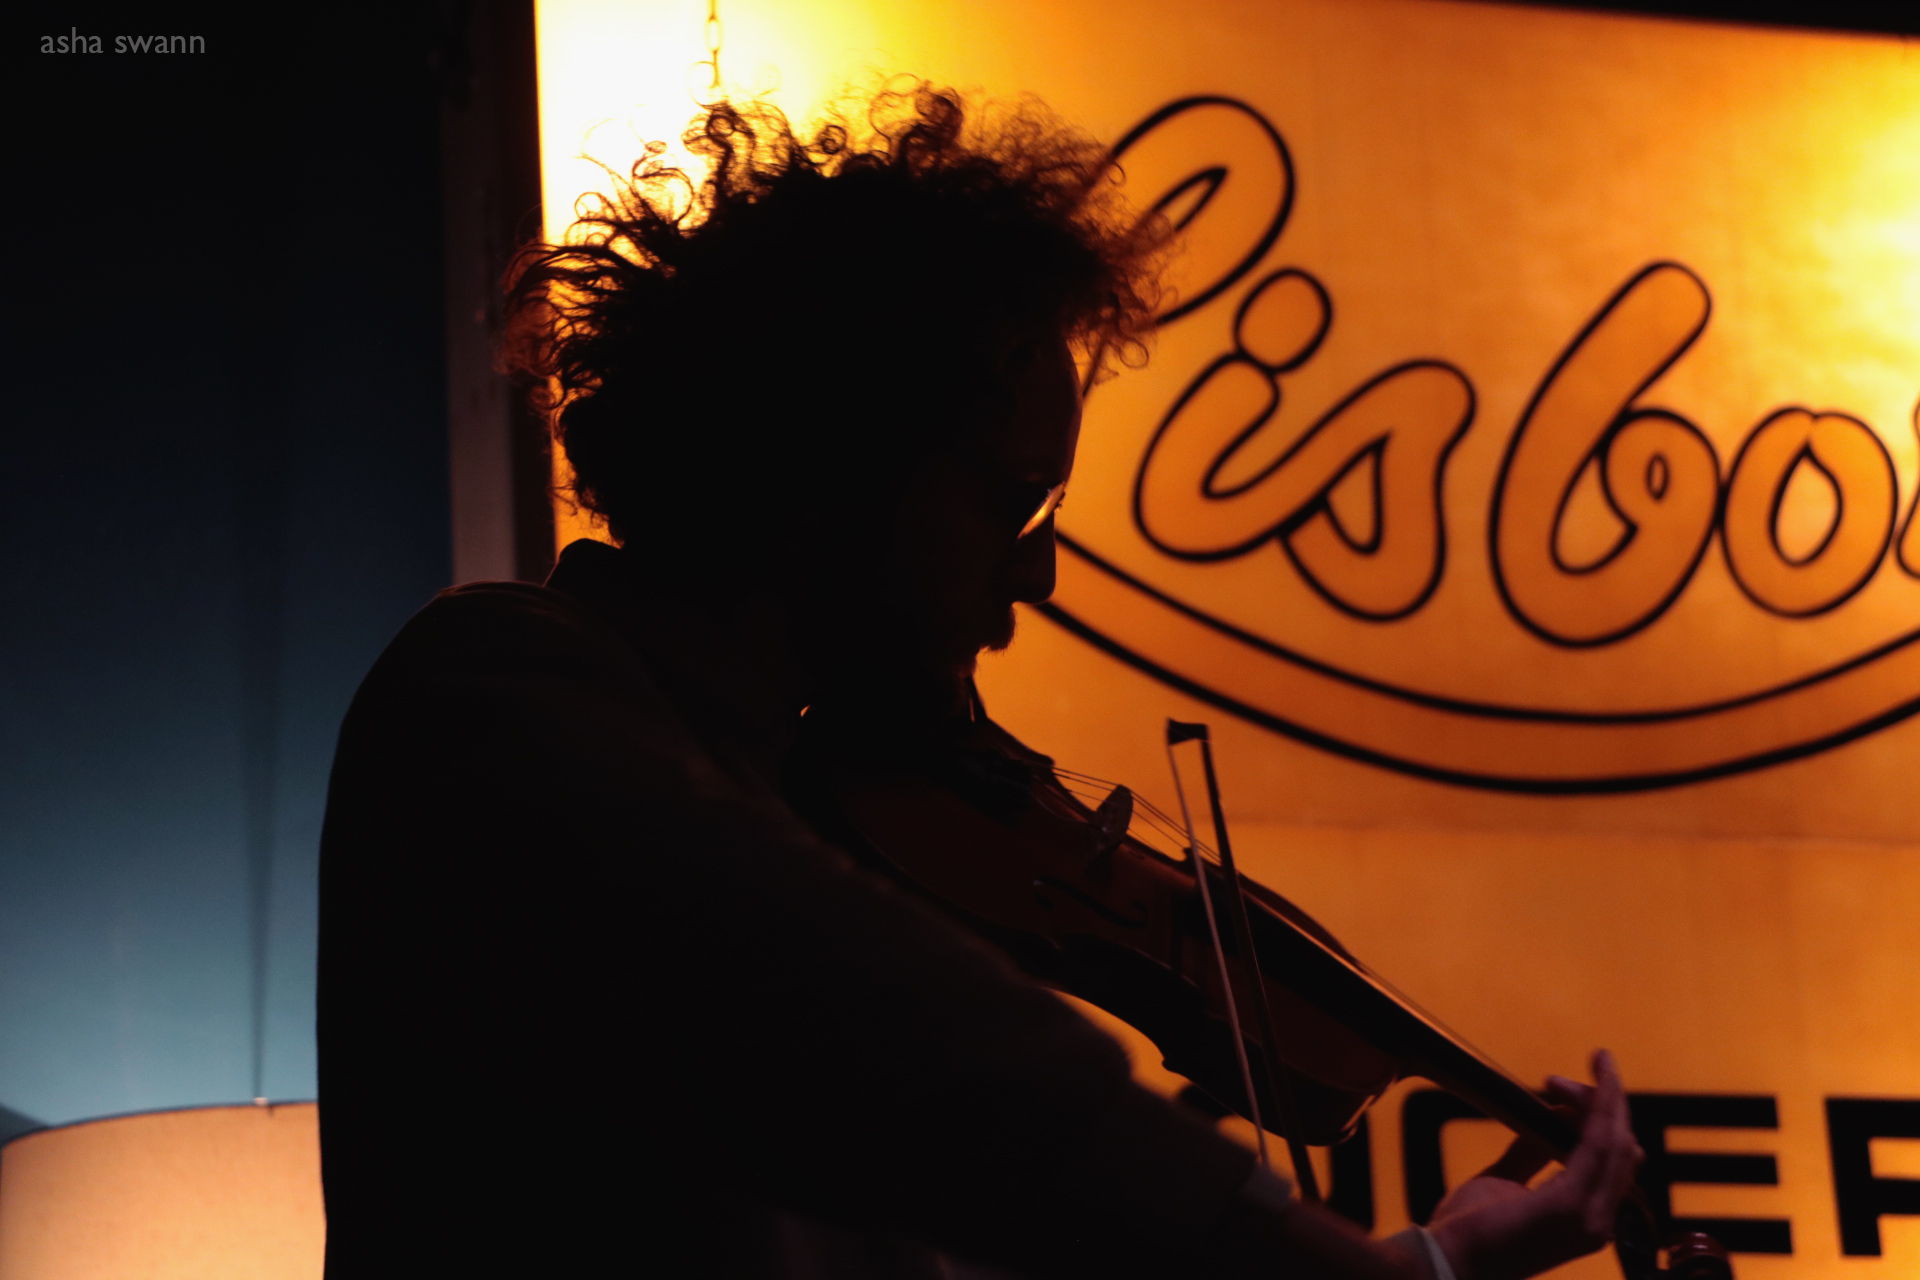 sol the violinist at bar robo